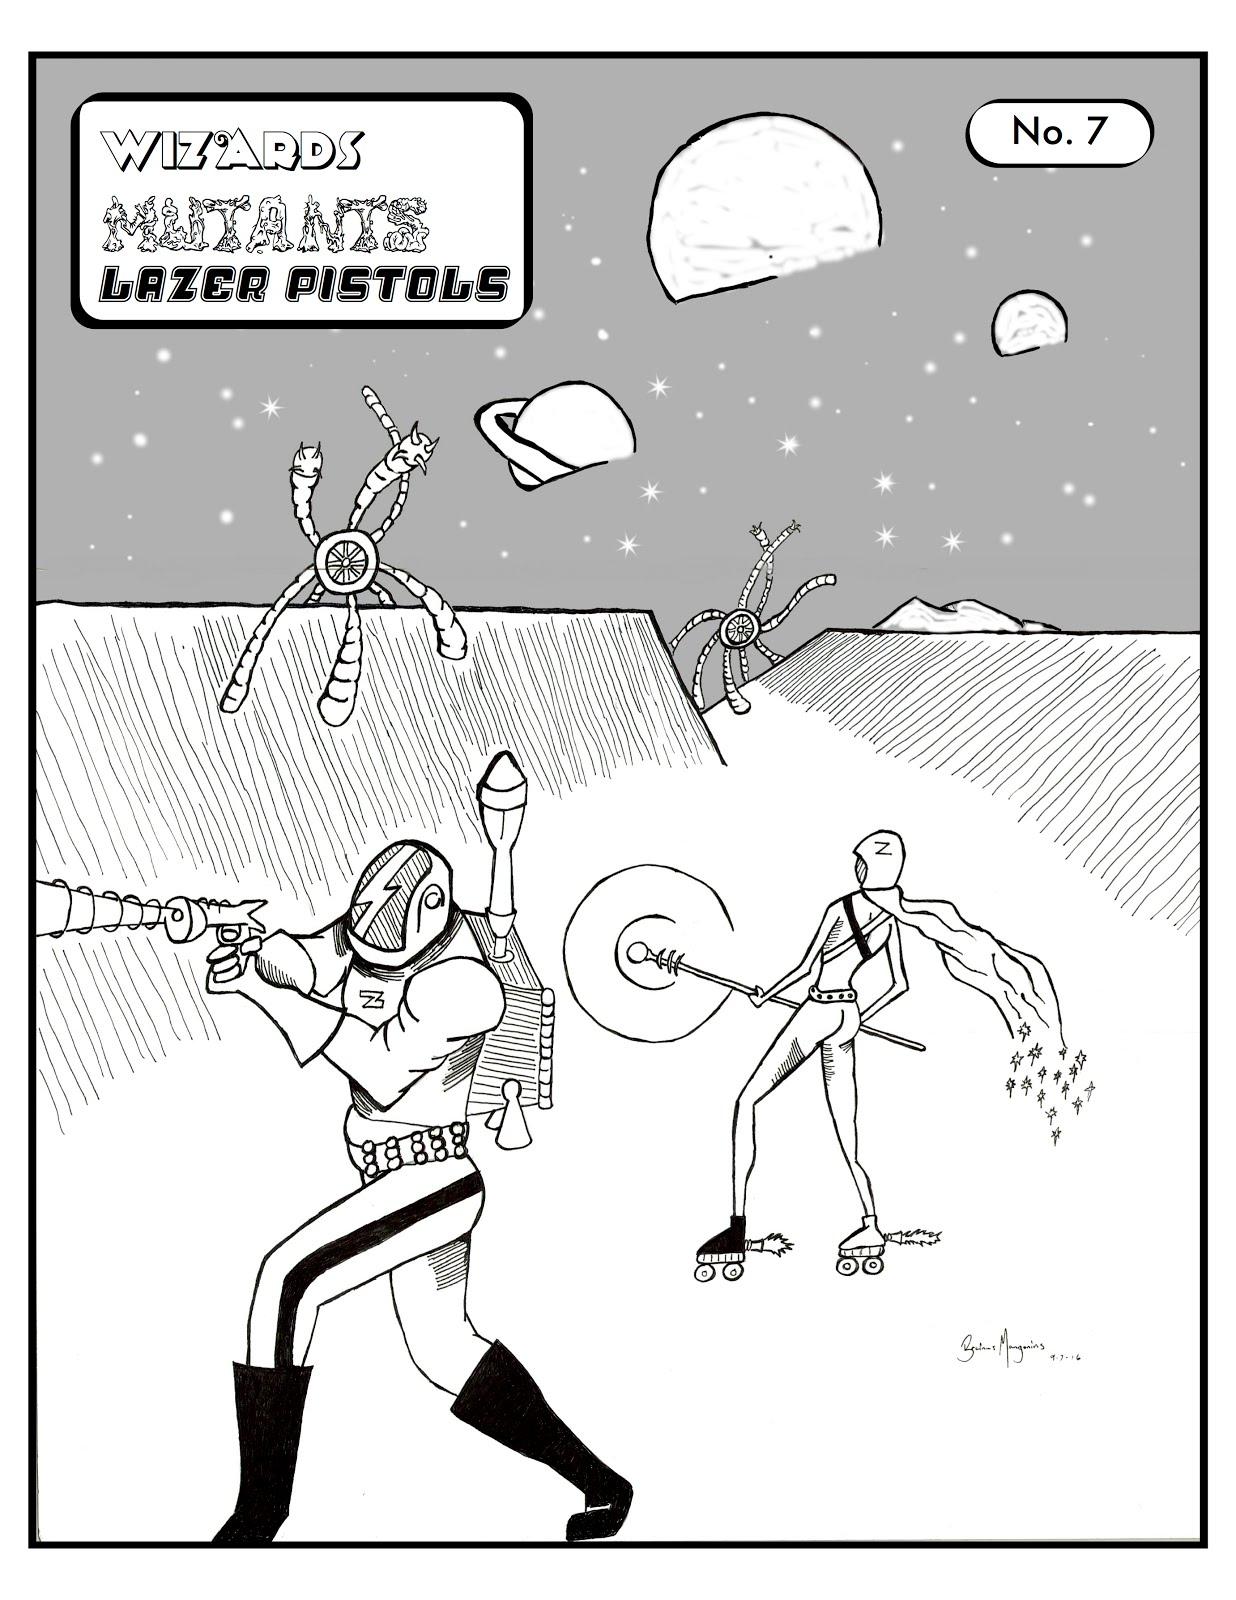 Wizards Mutants Laser Pistols: WMLP! Issue No 7 is here!